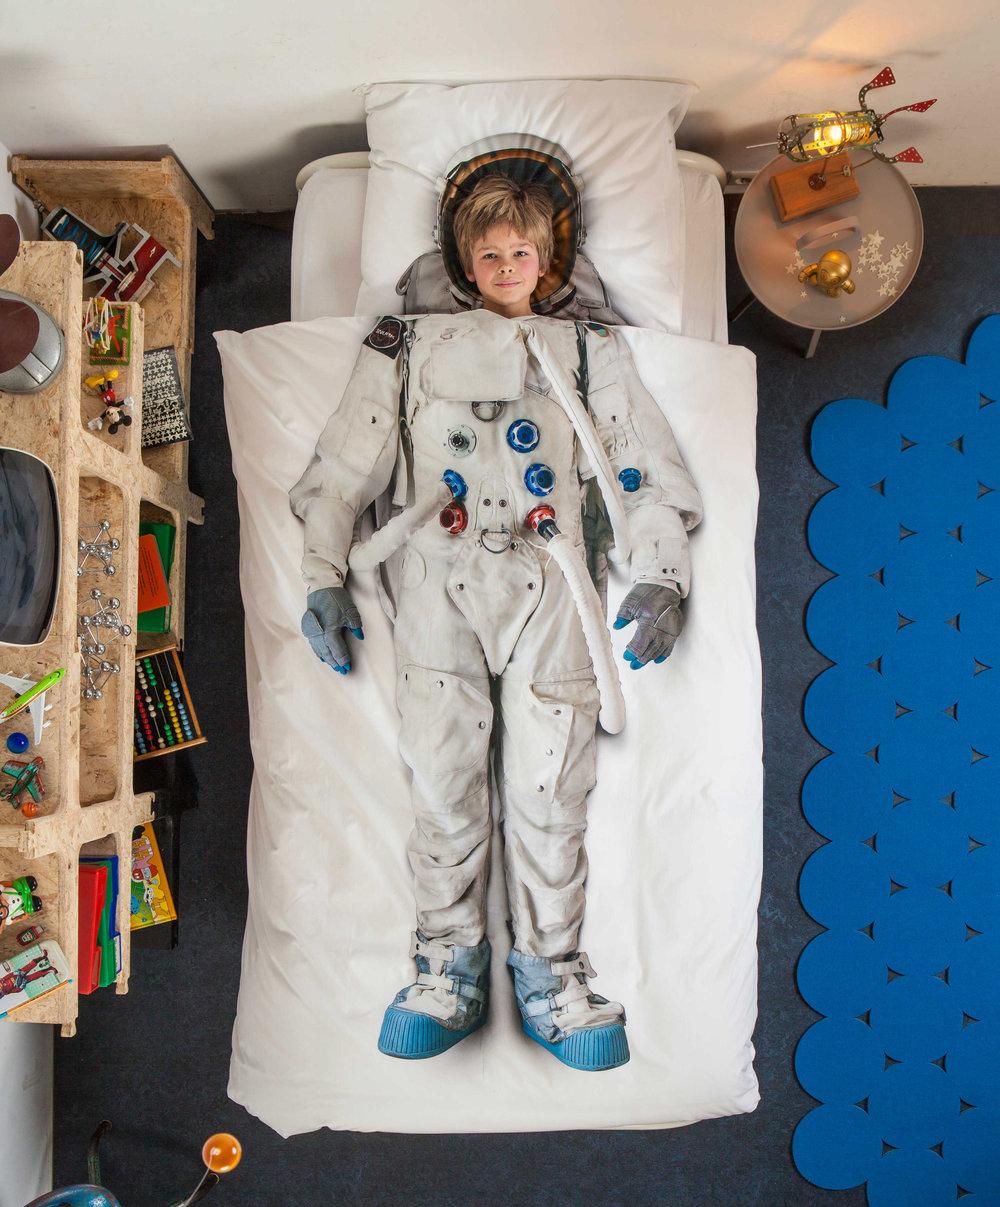 snurk-living-astronaut-cover-duvet-style-1